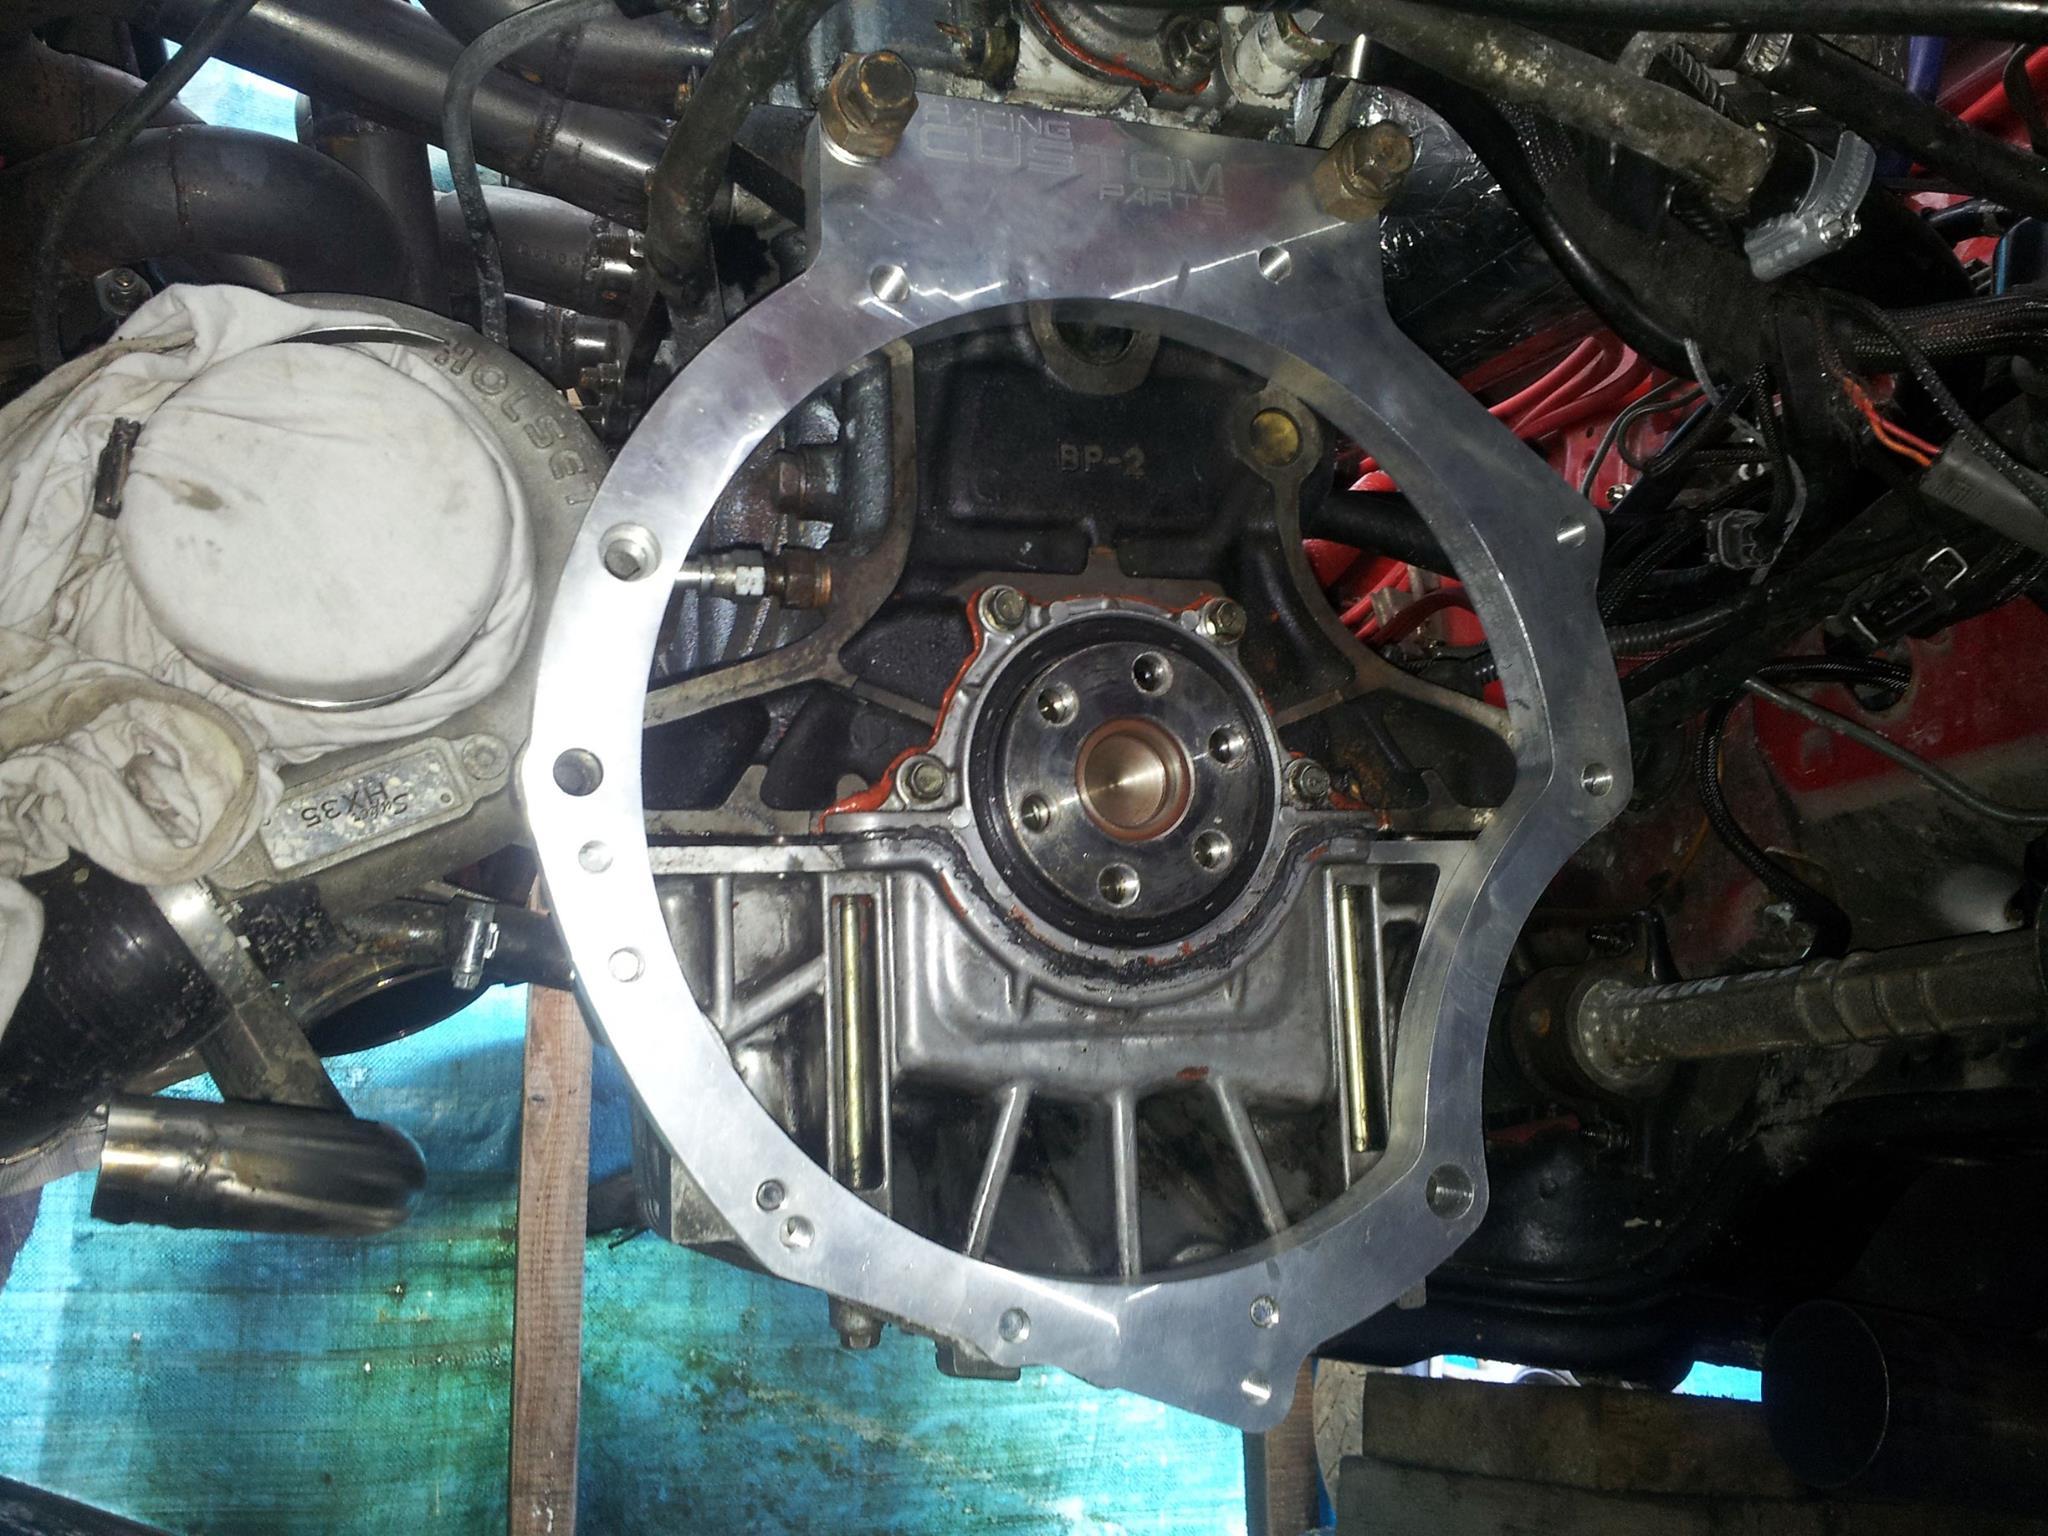 mazda 323f with a turbo 1 8 l bp engine swap depot rh engineswapdepot com Mazda B2300 Engine Mazda 3.0 V6 Engine